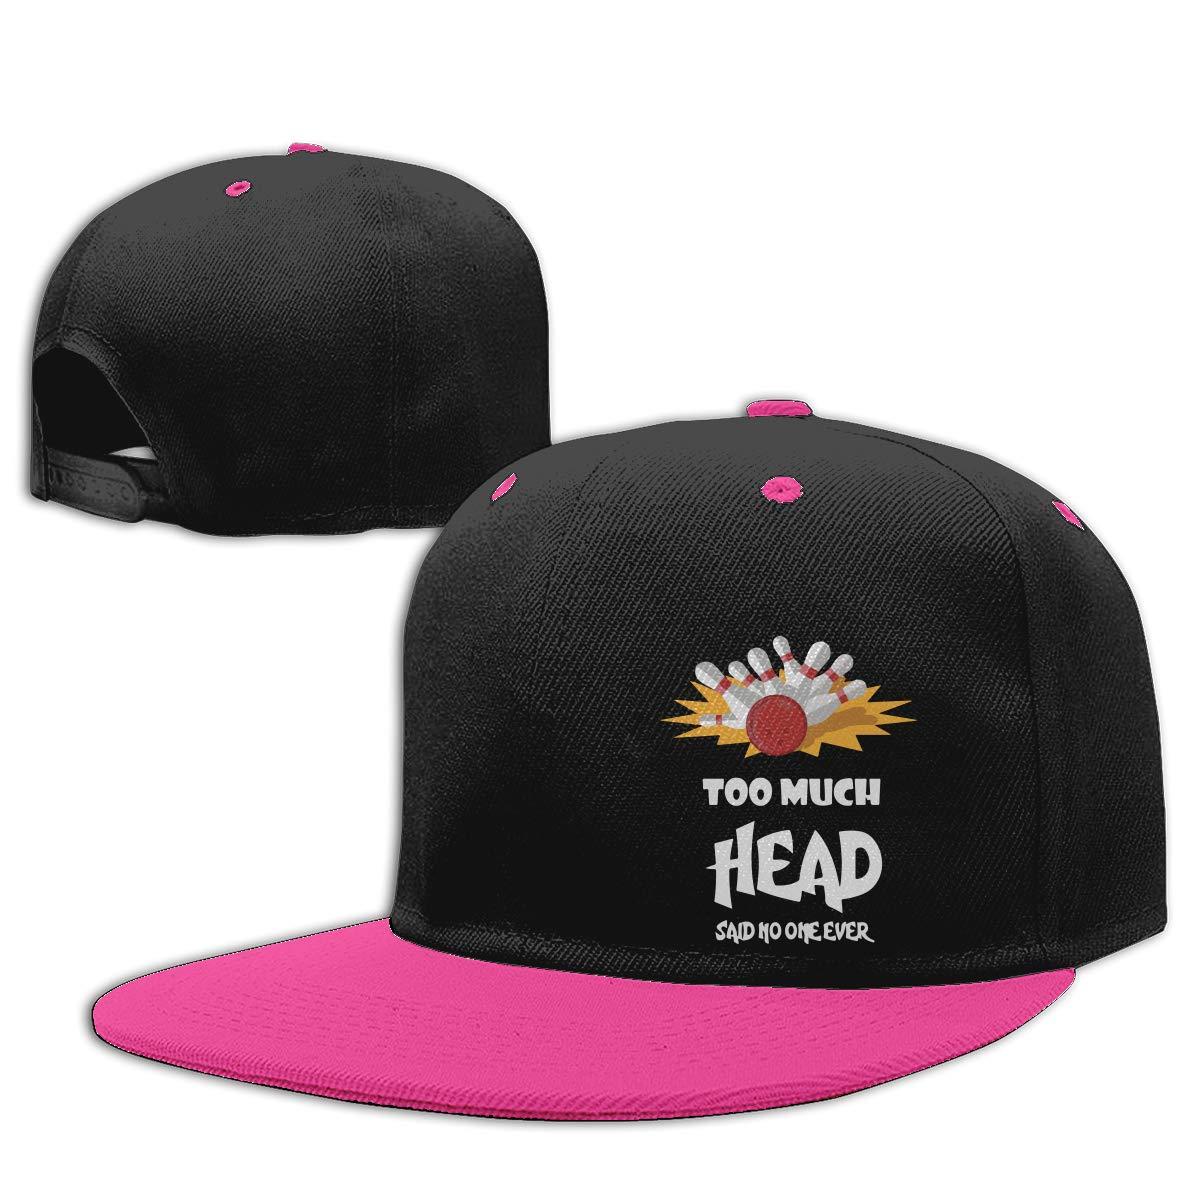 Too Much Head Said No One Ever Adults Flat Bill Baseball Caps Women Men Hiphop Cap